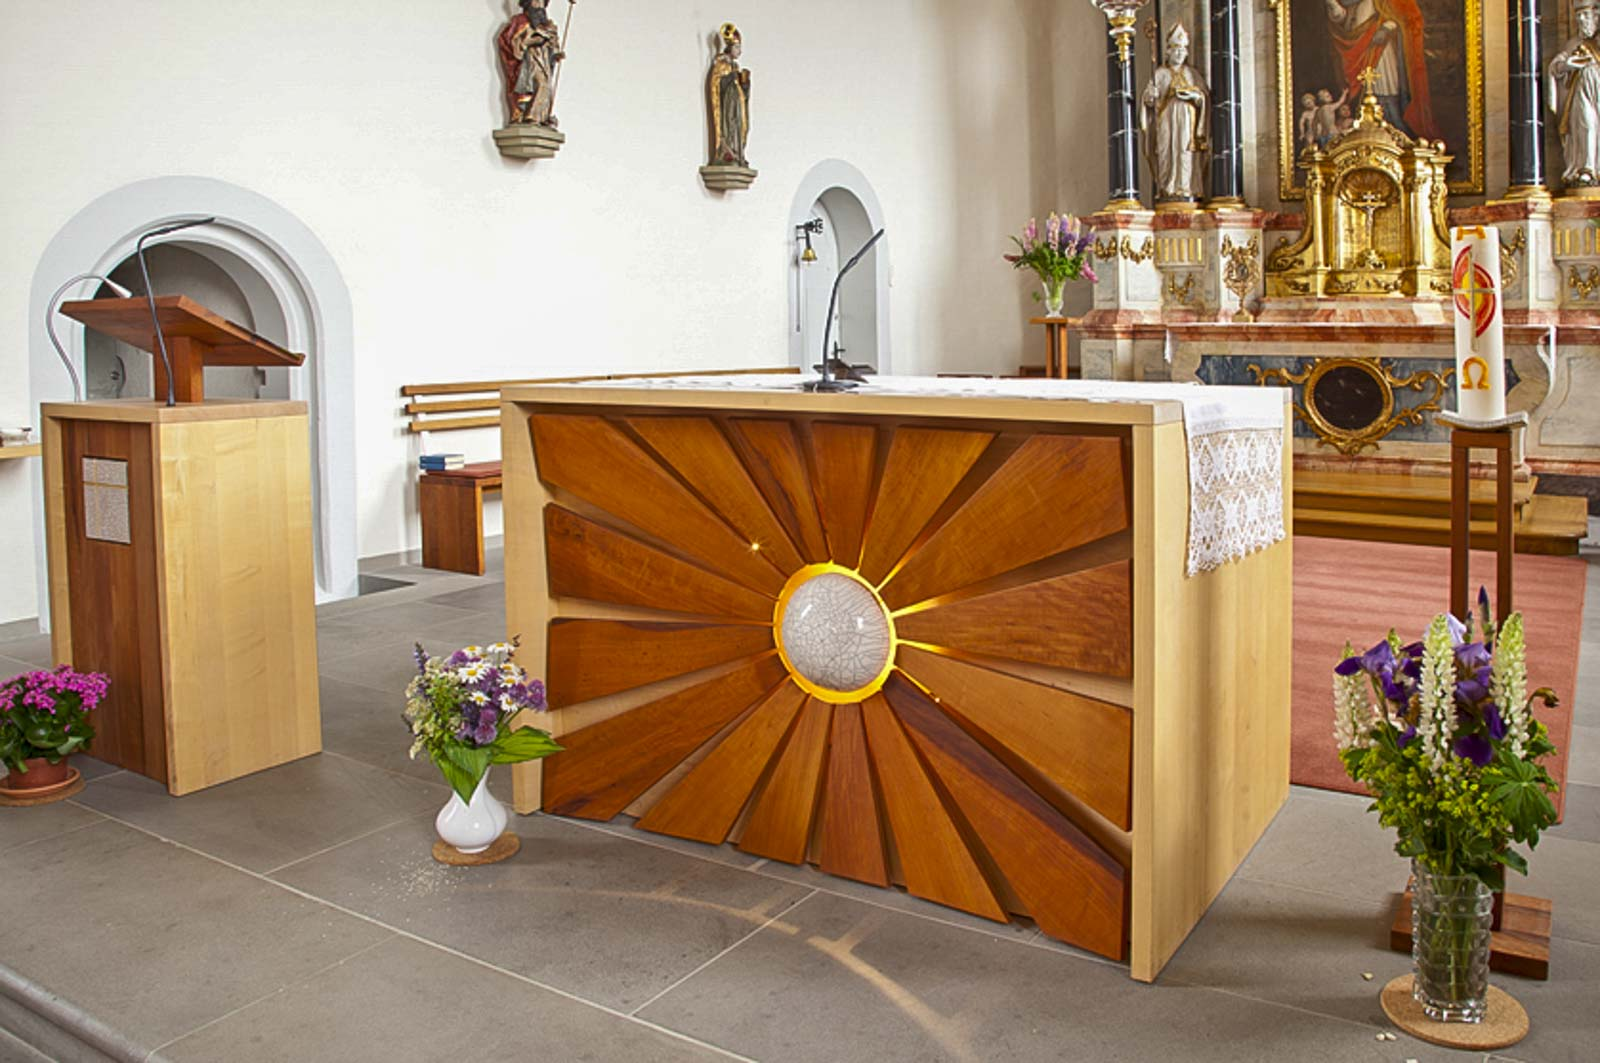 Woodesign_öffentliche Bauten_Kirchenmöbel_Altar_Ambos_Stühle_Osterkerze_Massivholz_Ahorn_Birnbaum_Raku_Kirche Rechthalten (5)